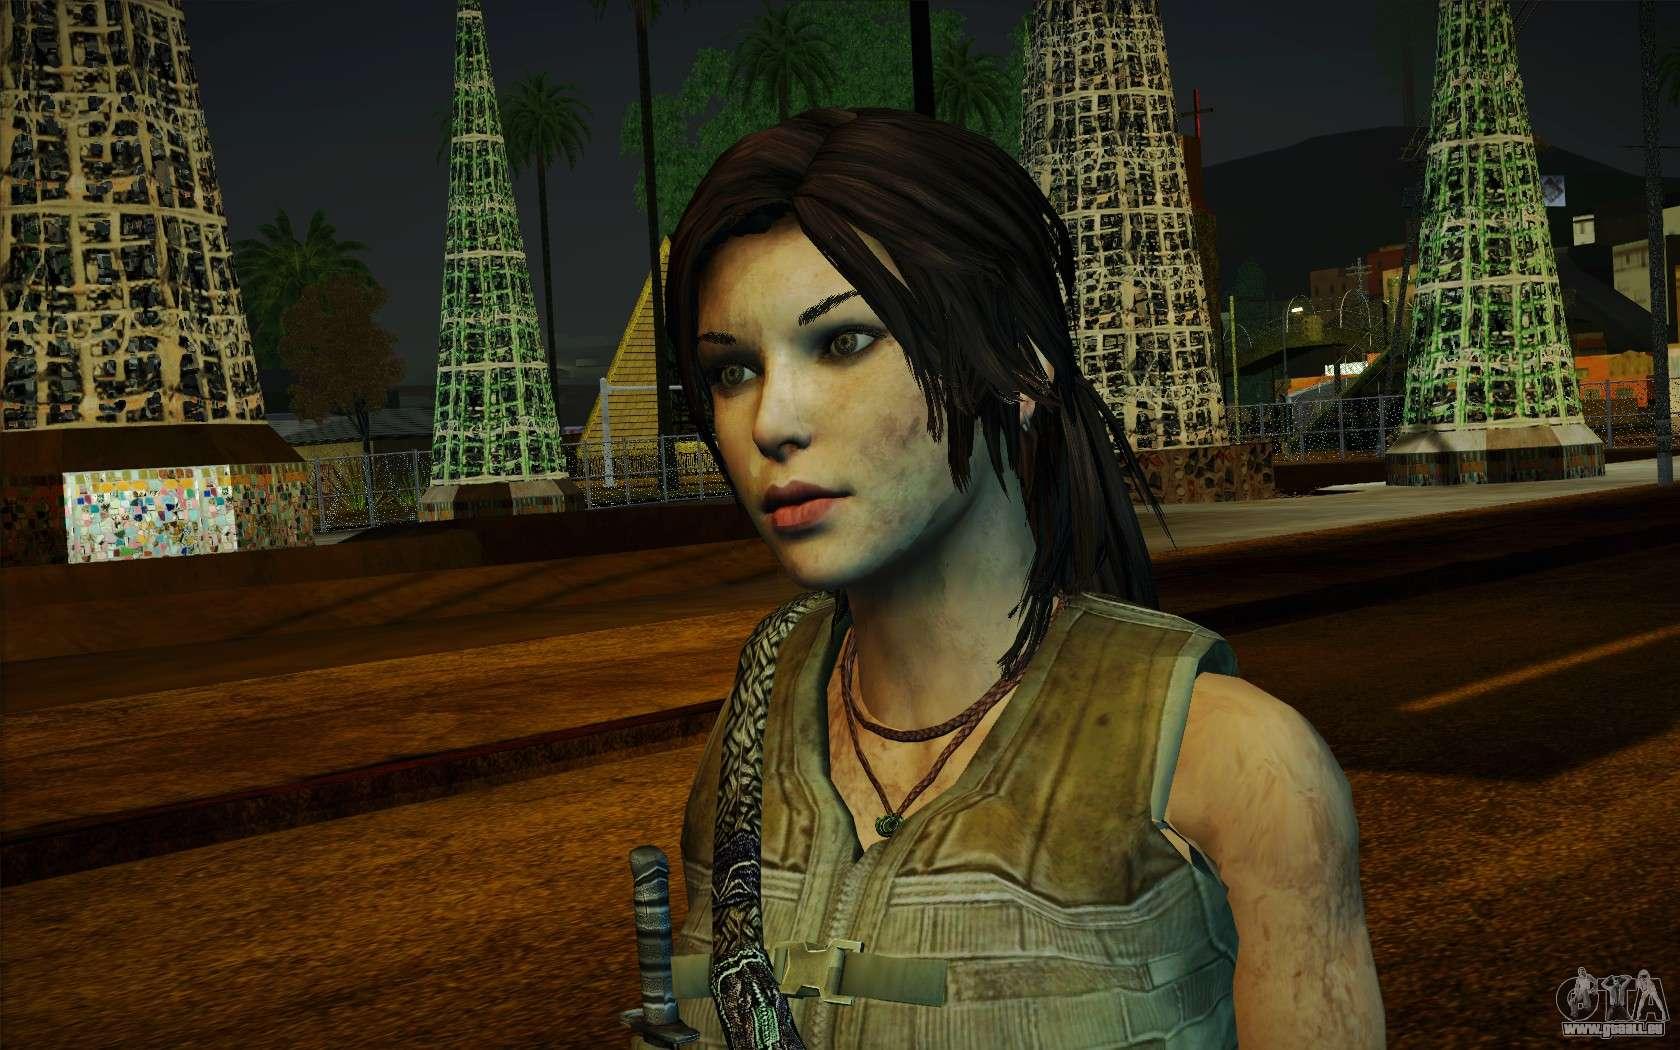 GTA San Andreas Tomb Raider Lara Croft Guerilla Outfit Mod